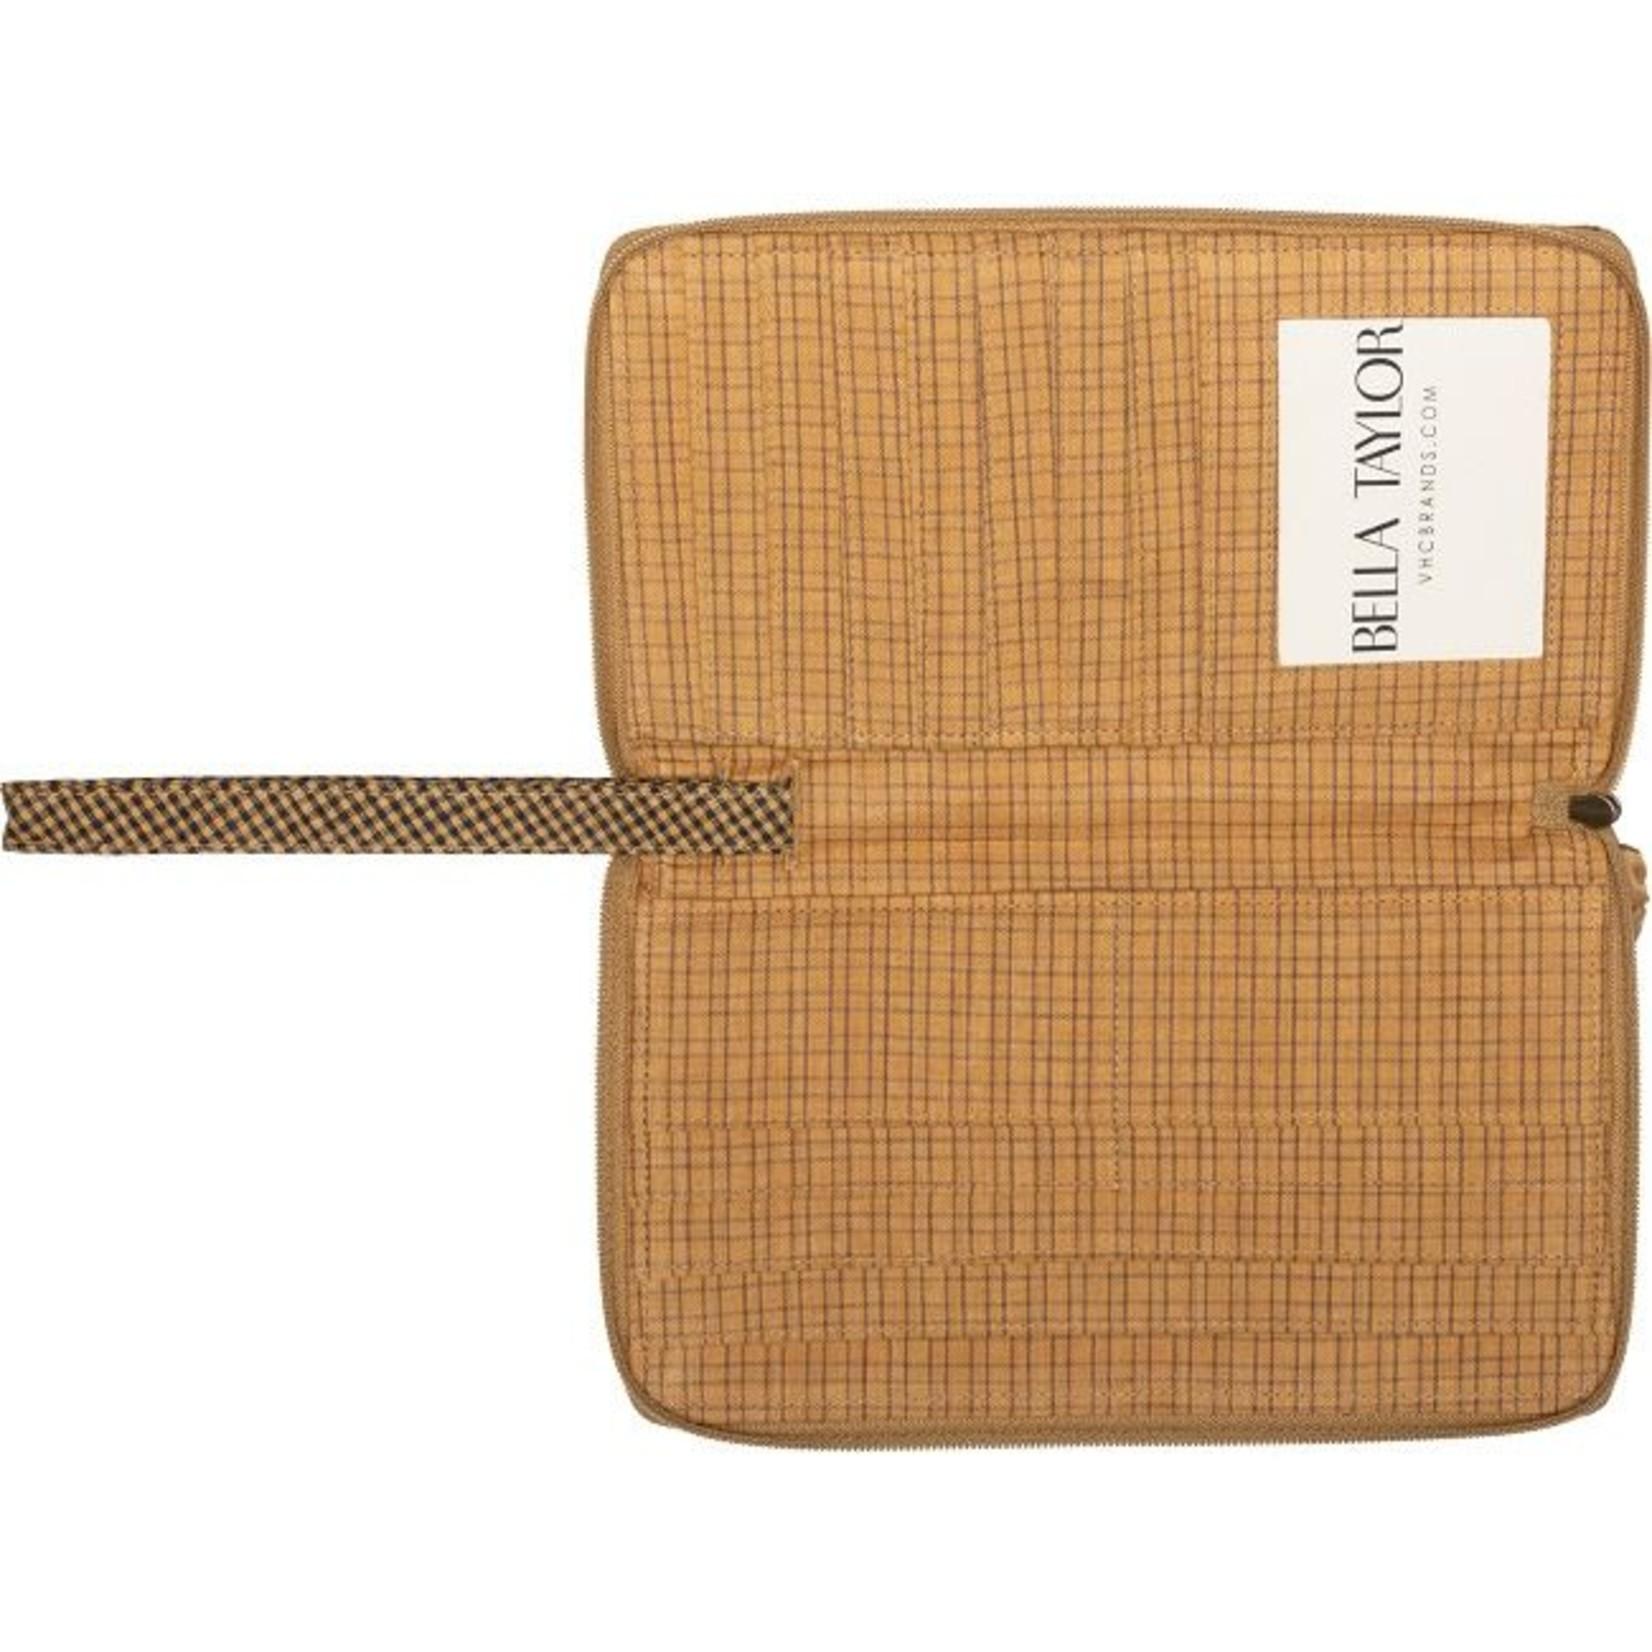 Bella Taylor Heritage - Wrist Strap Wallet